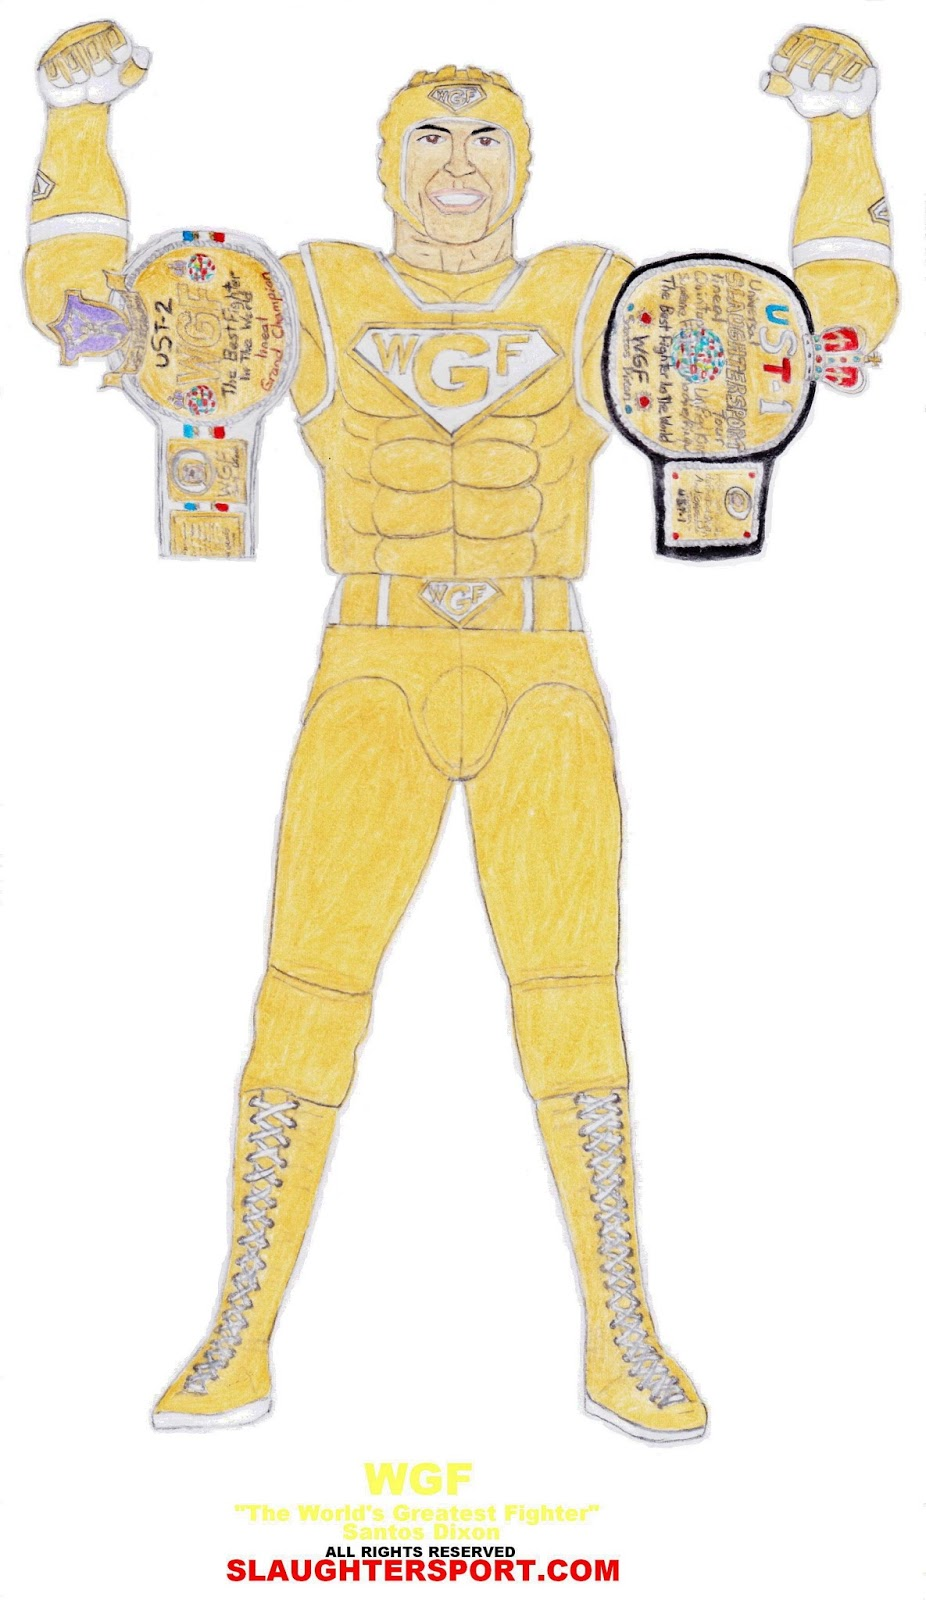 WGF - The Worlds Greatest Fighter Santos Dixon SLAUGHTERSPORT.COM